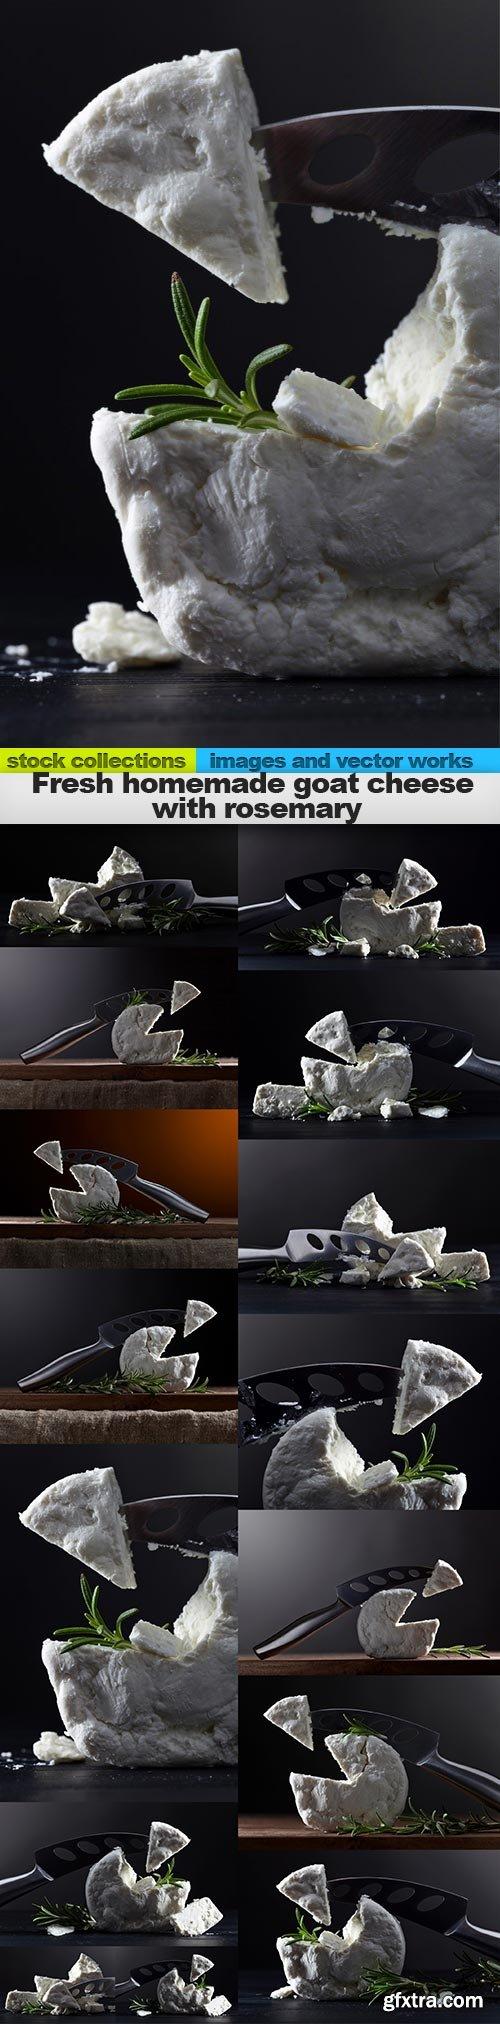 Fresh homemade goat cheese with rosemary, 15 x UHQ JPEG